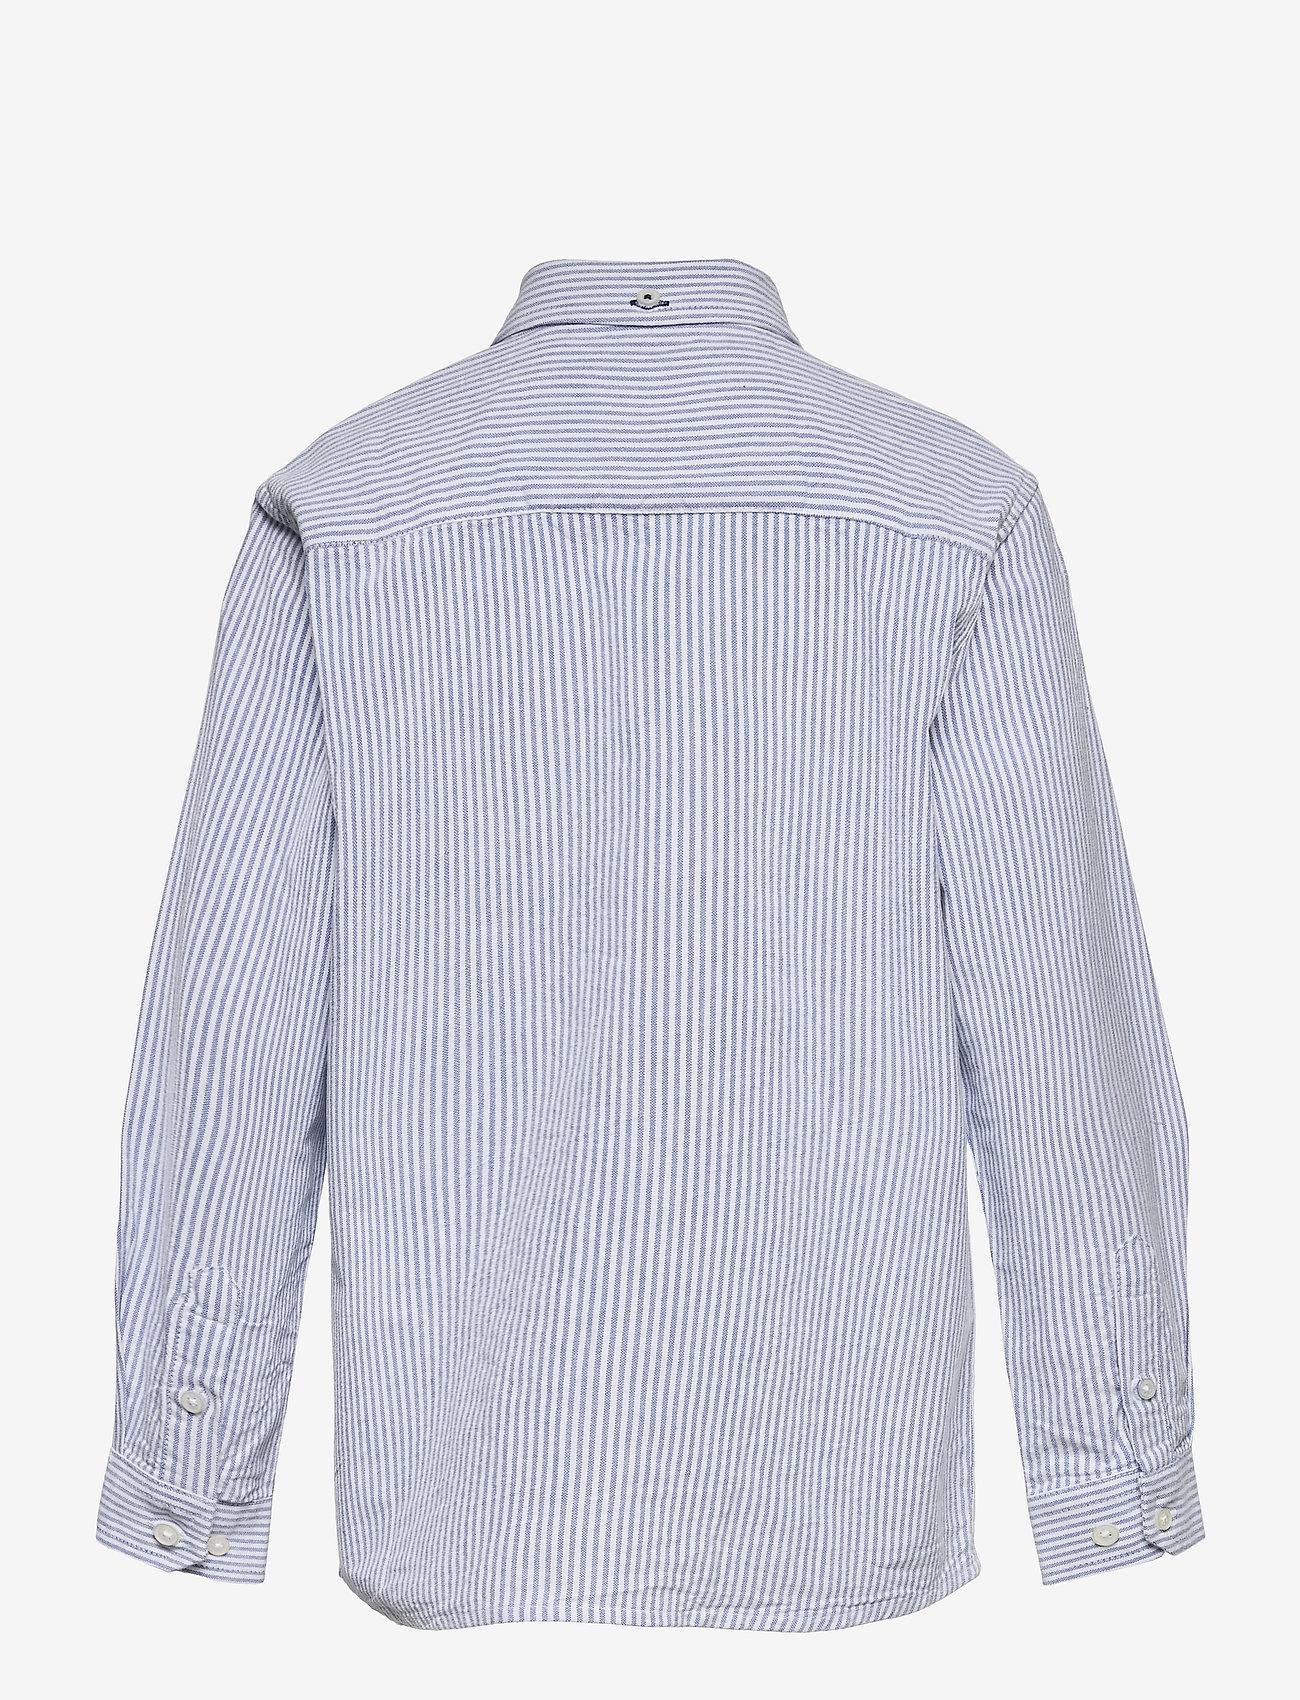 Kronstadt - Johan Oxford Stripe - shirts - white / light blue - 1